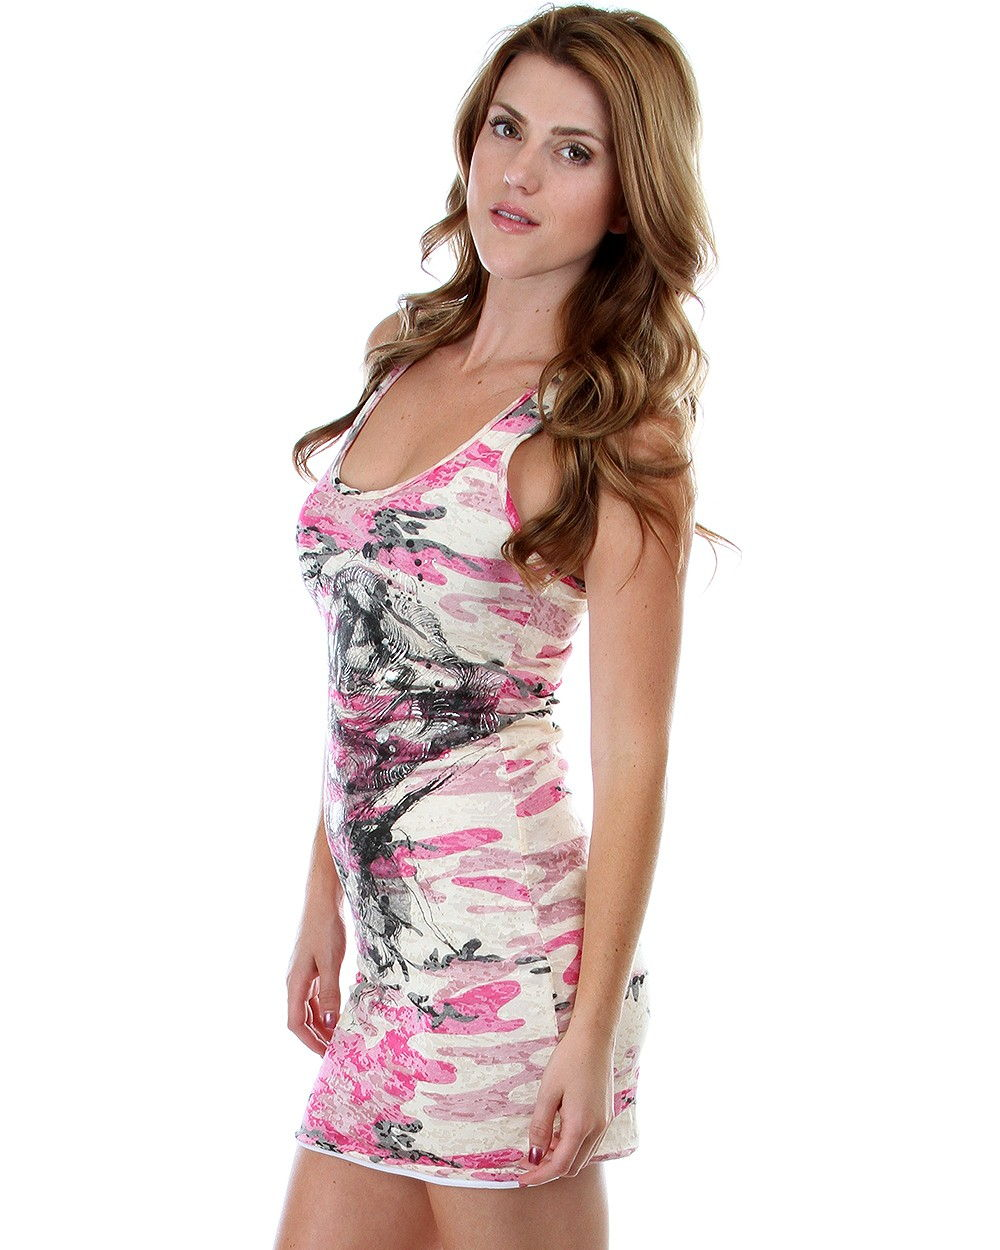 Formal Camo Wedding Dresses | Dream Wedding IdeaS Around The World